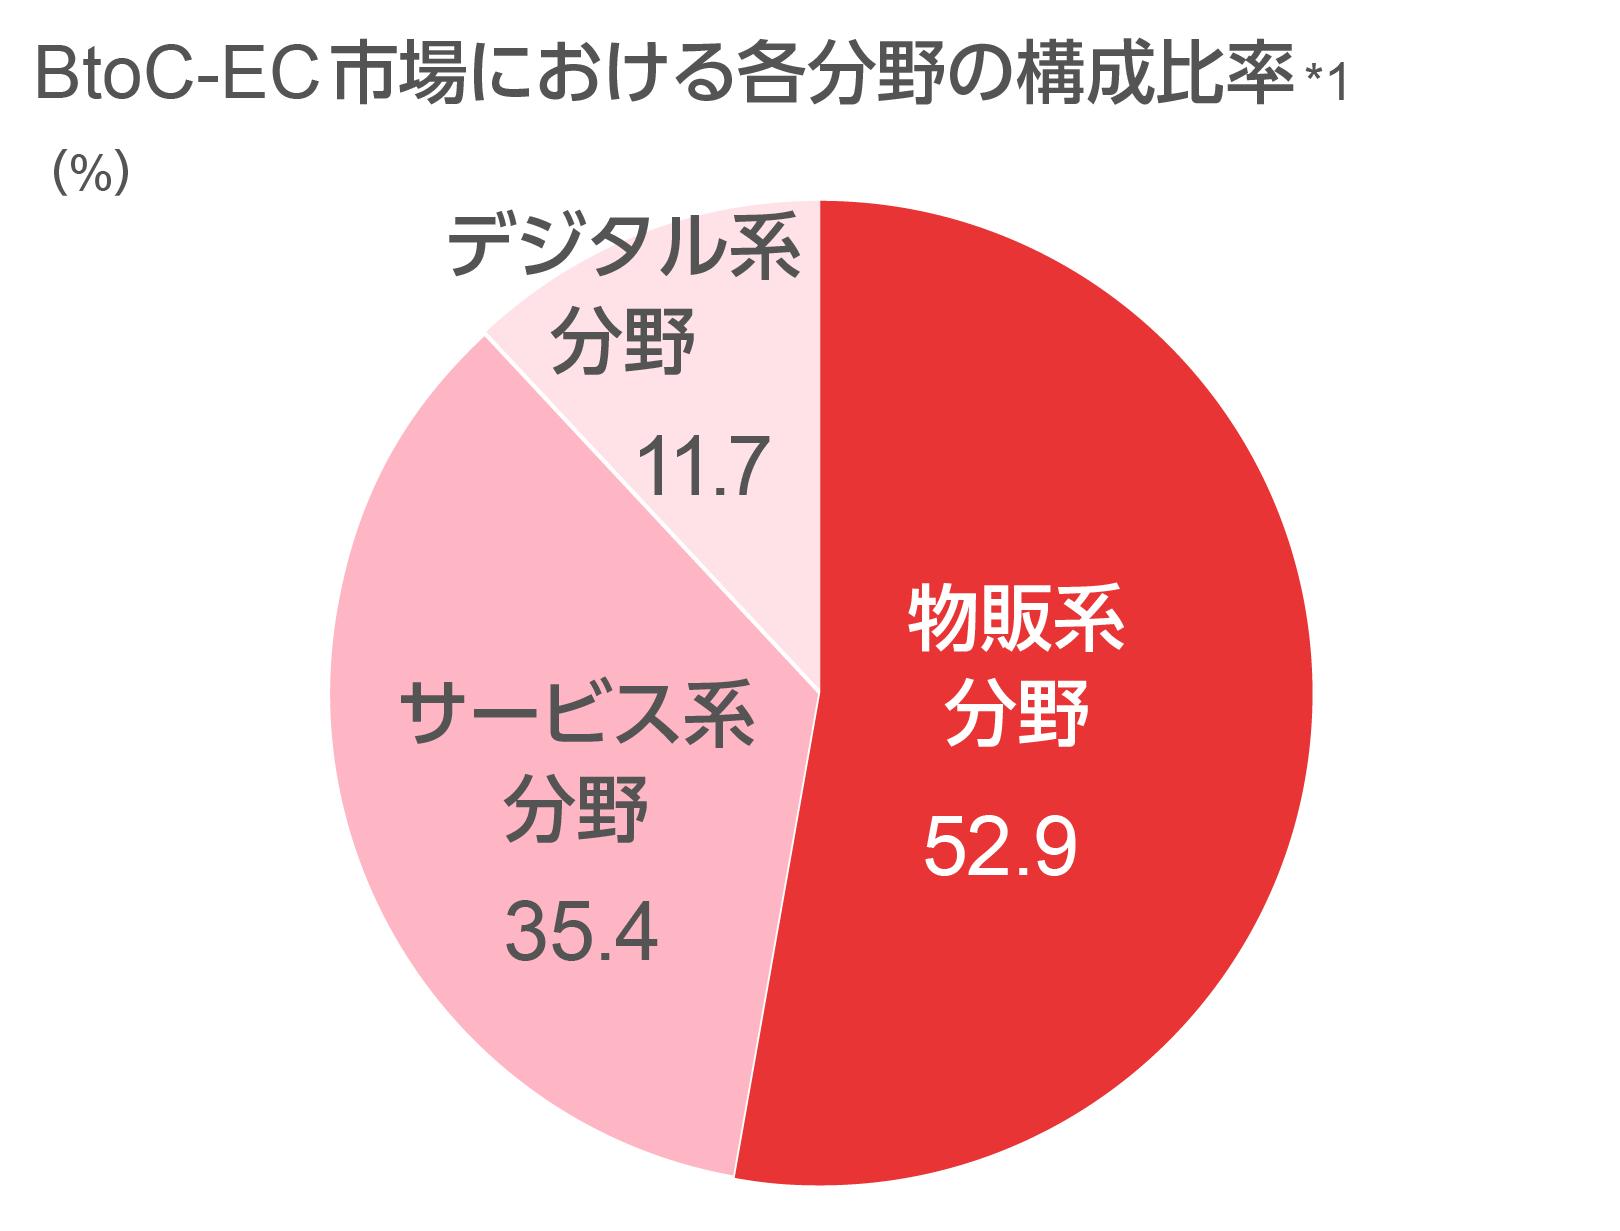 BtoC-EC市場における各分野の構成比率のグラフ図